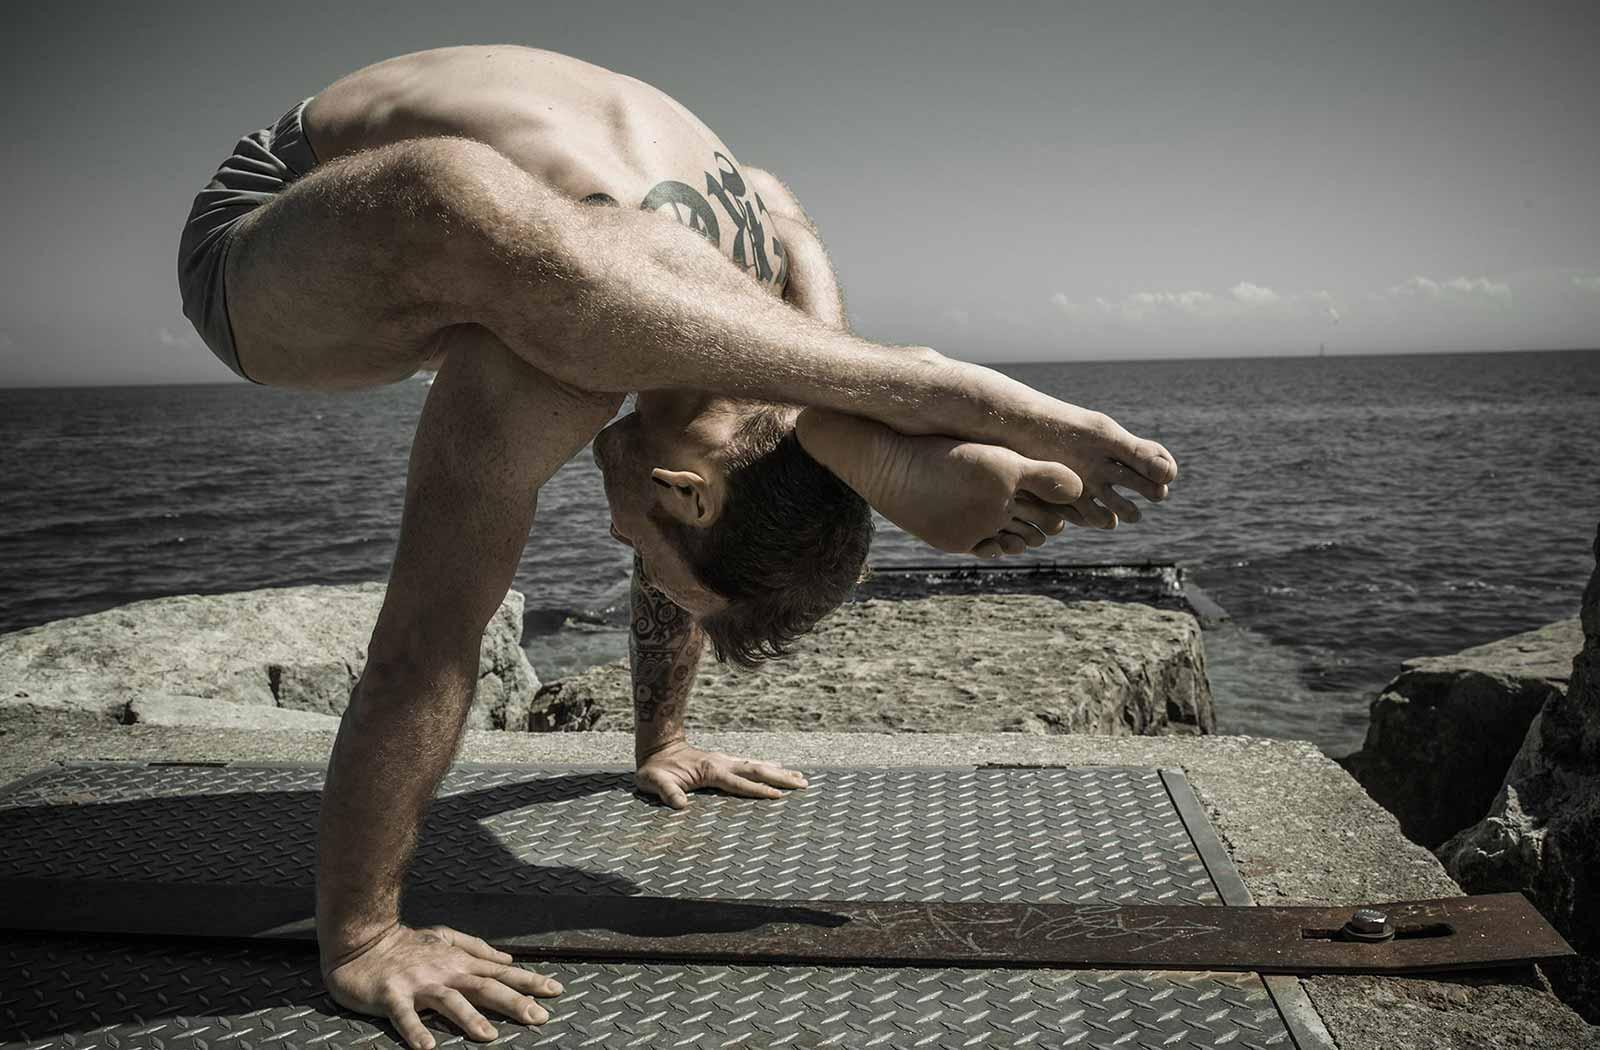 Ashtanga – The Practice of Equanimity